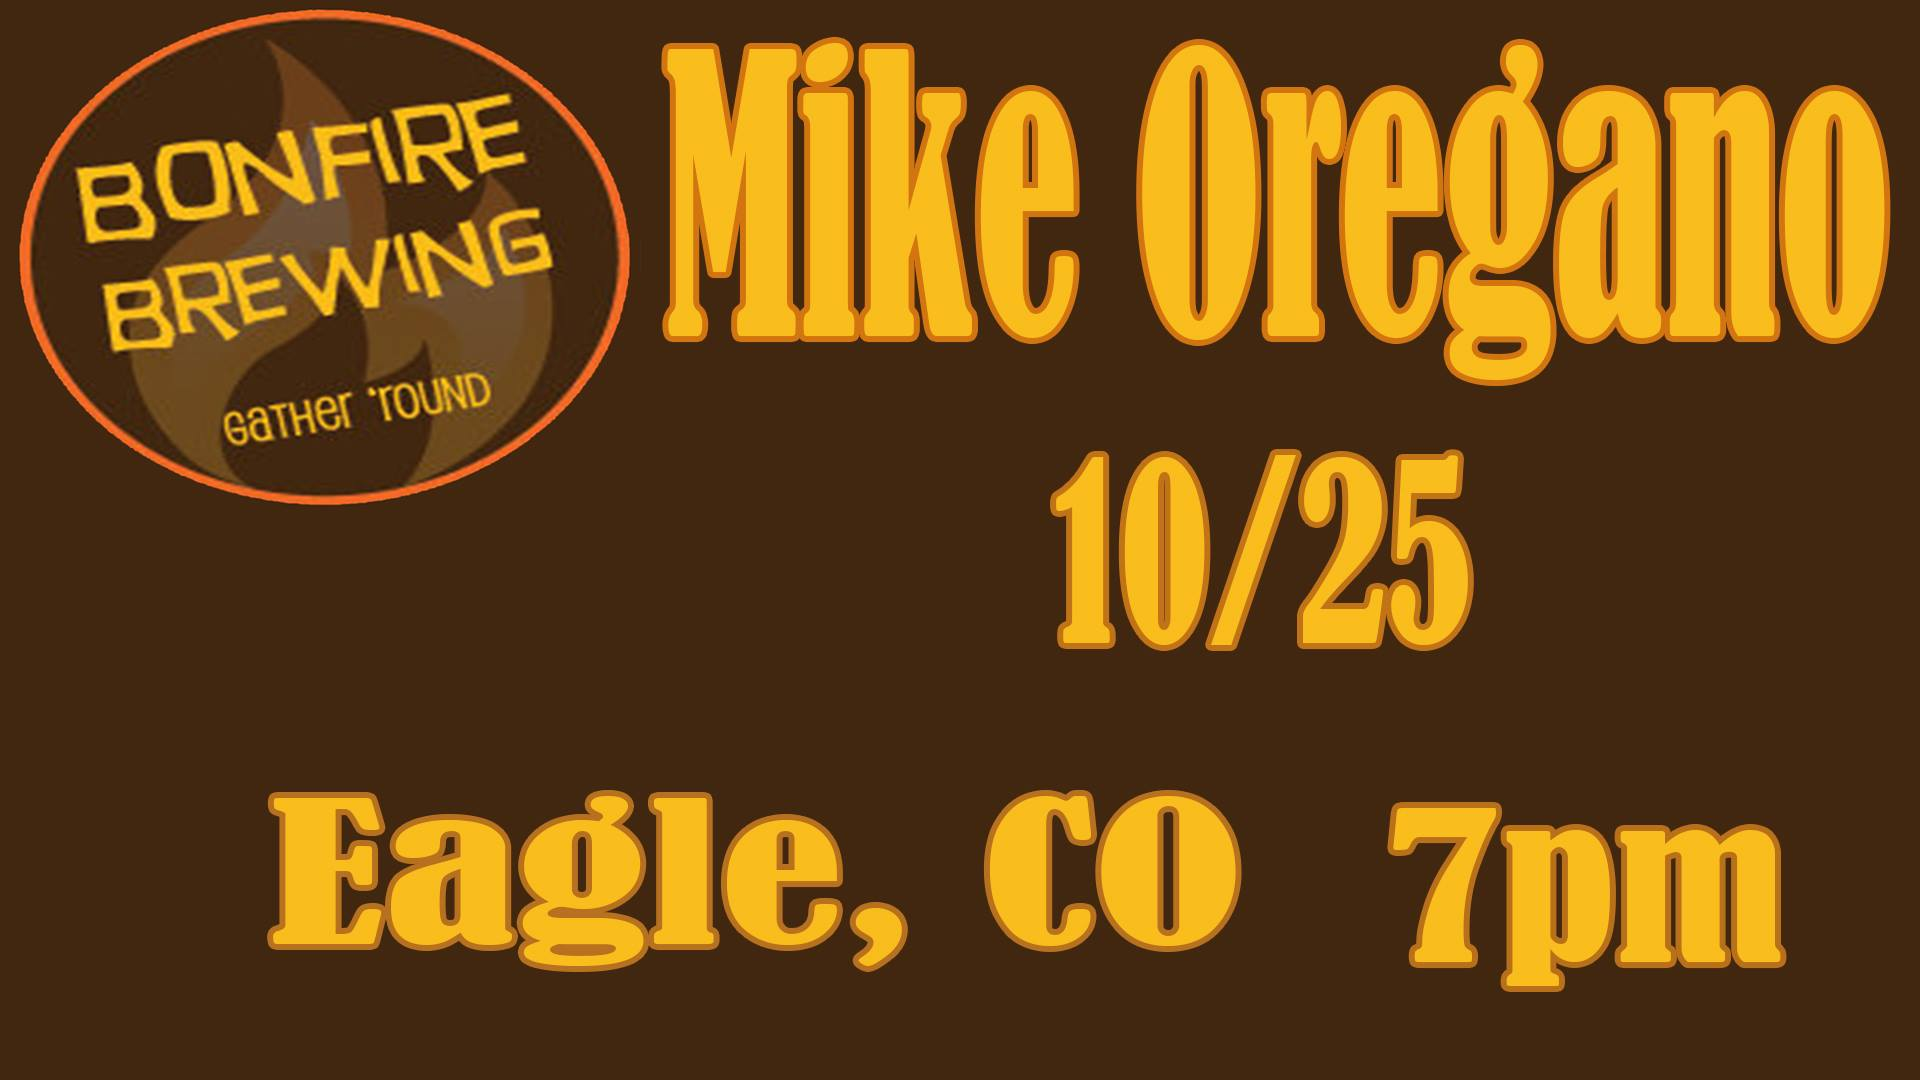 mike oregano bonfire brewing